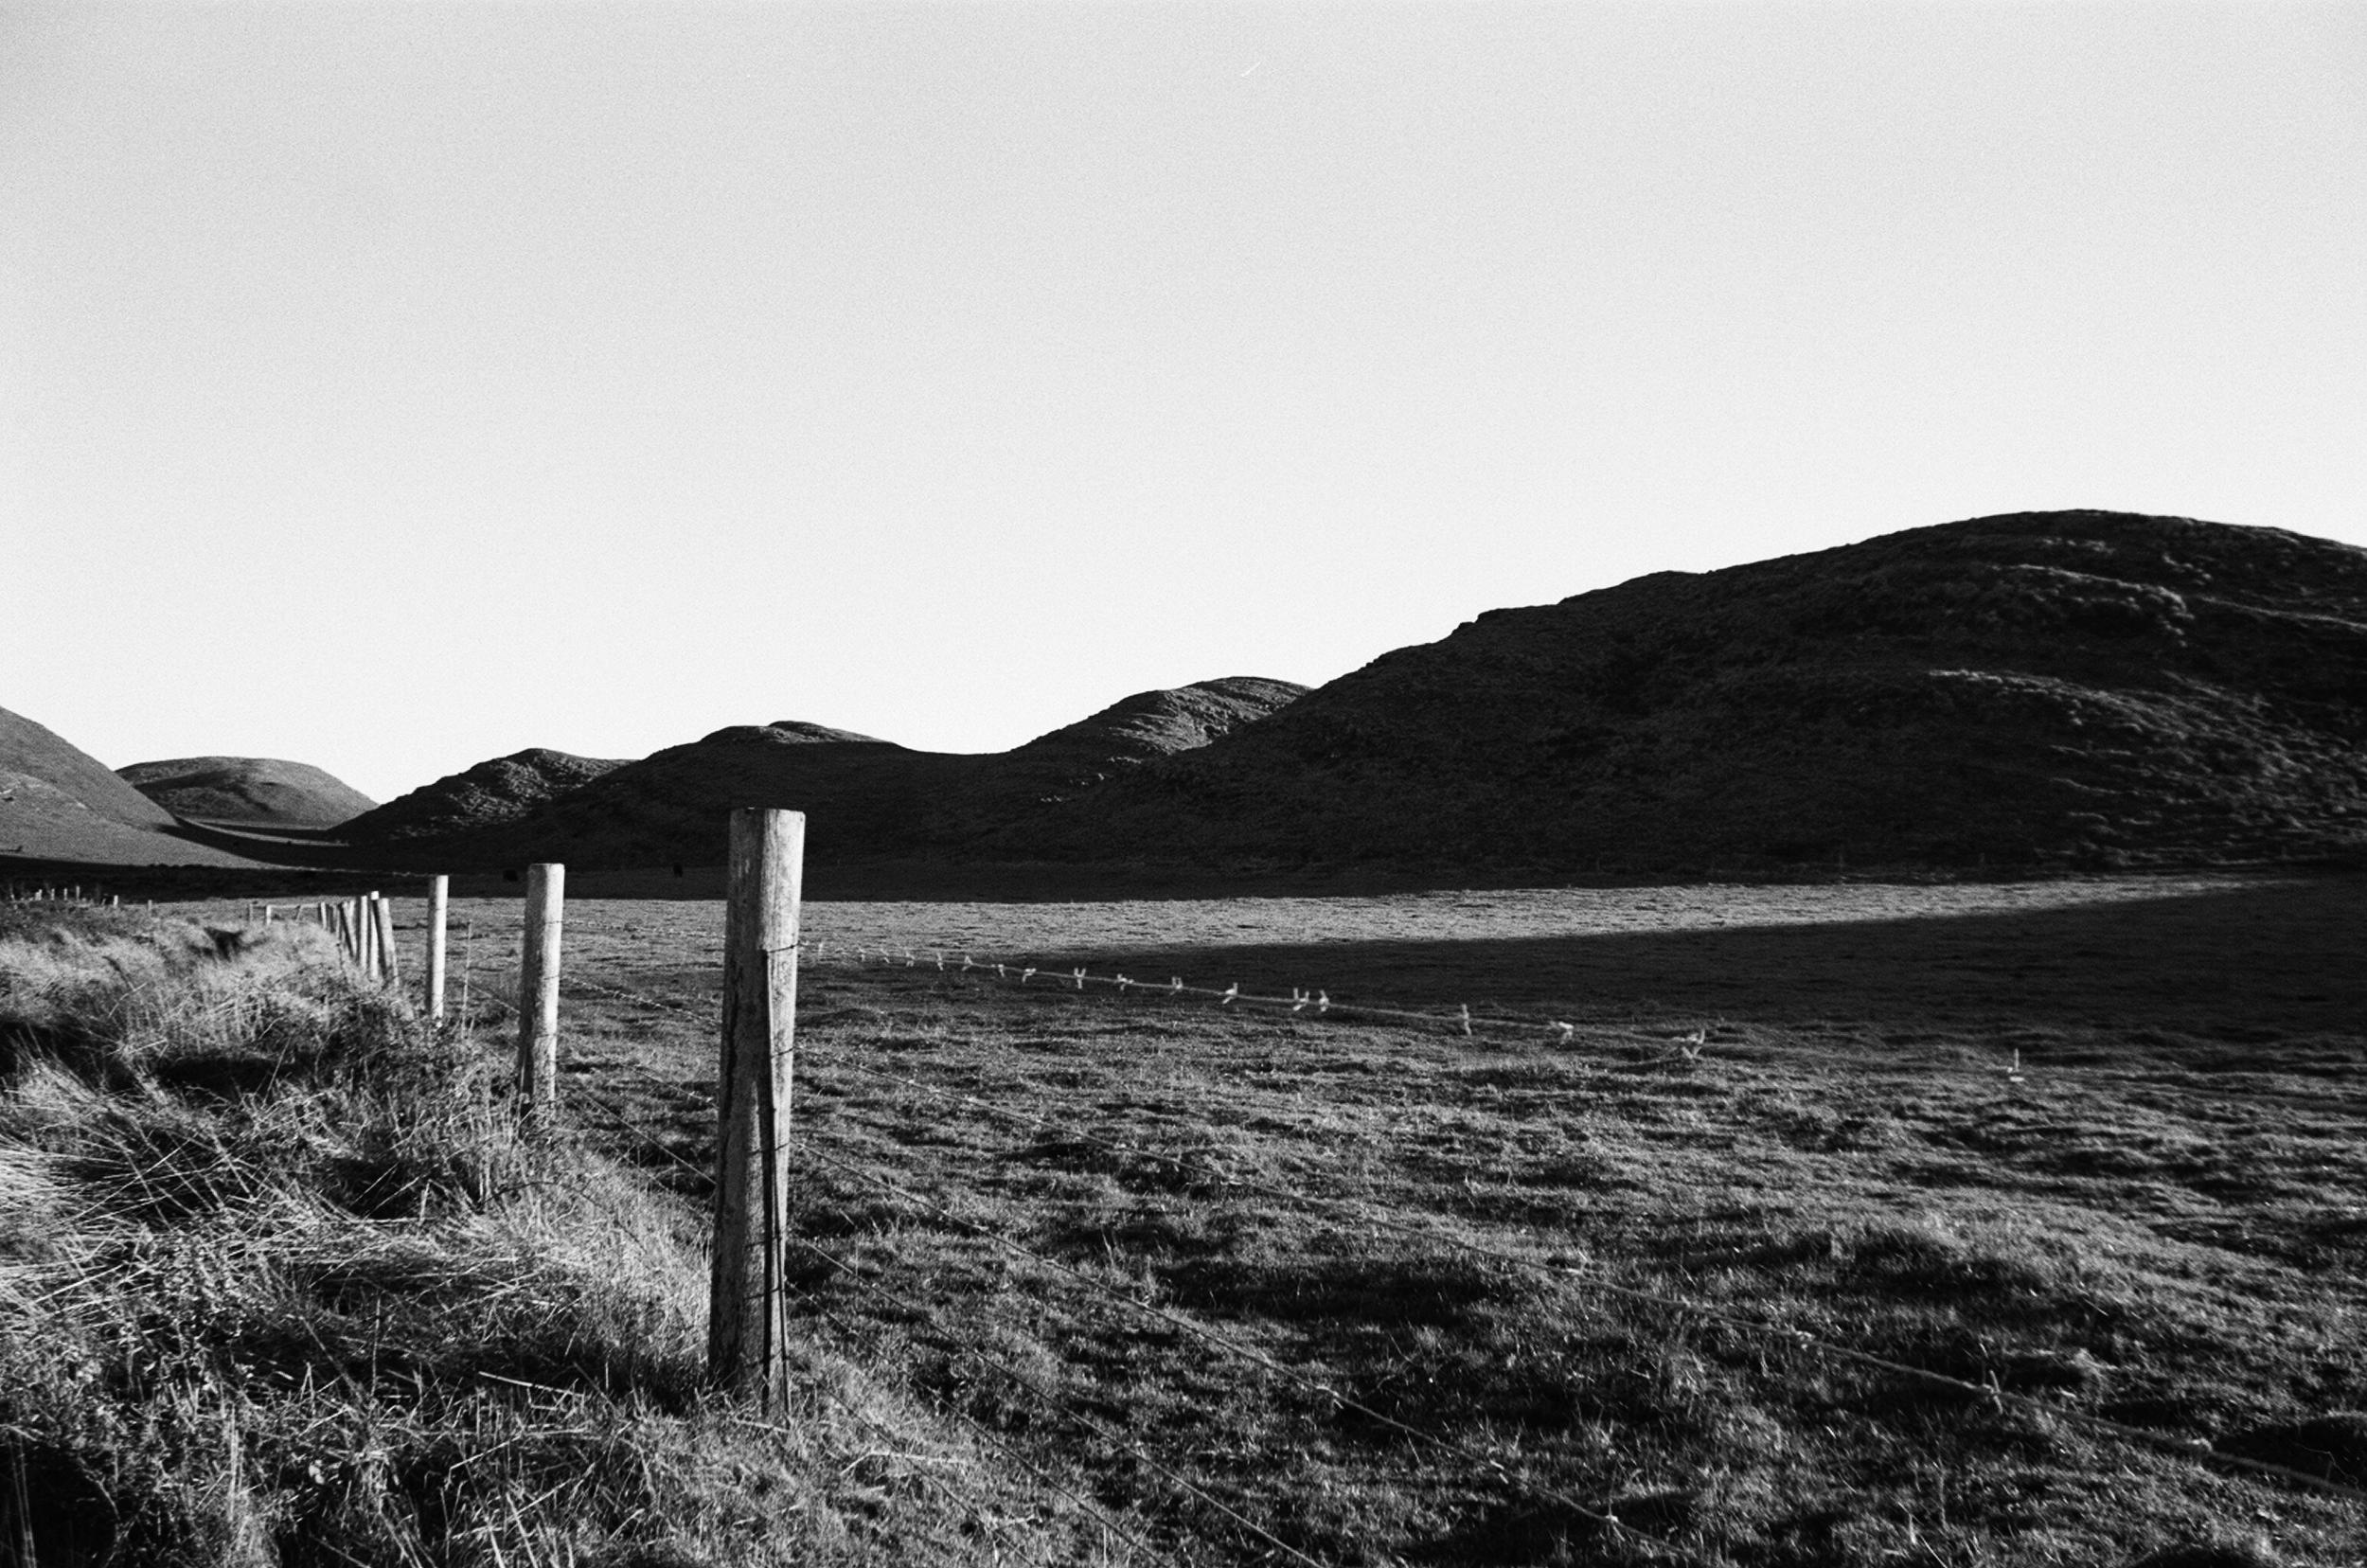 Point Reyes, 35mm